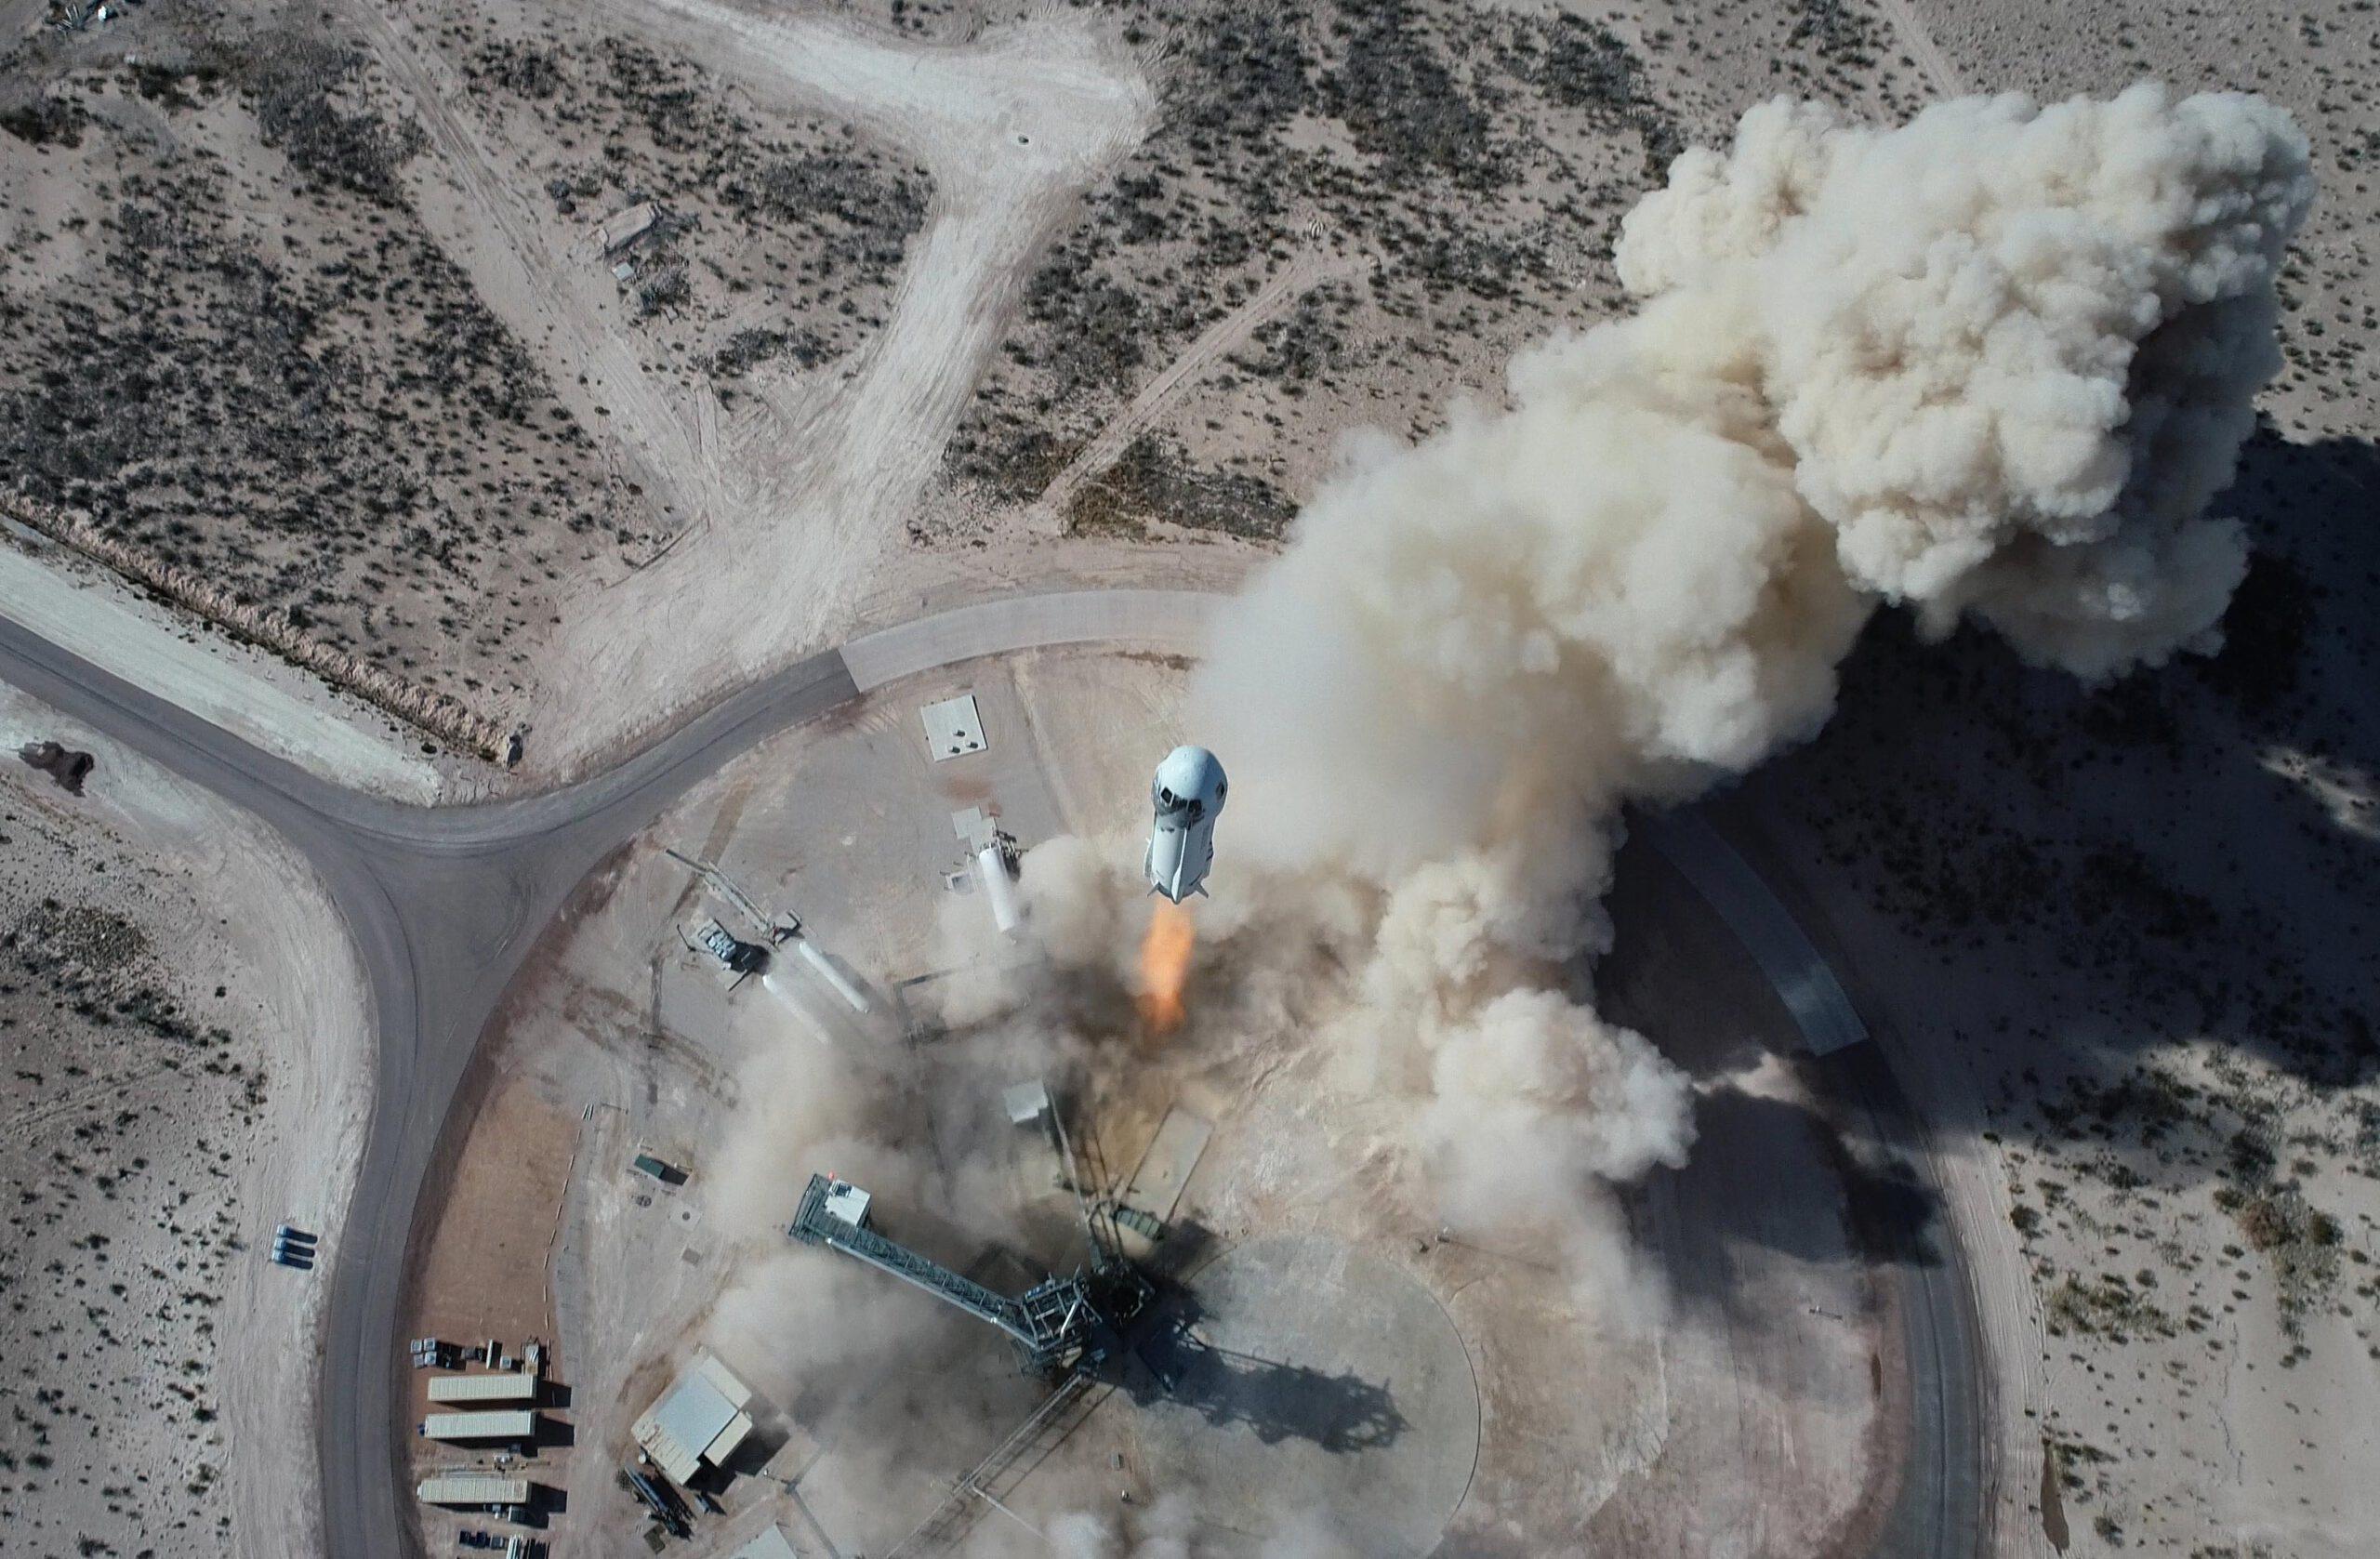 photo-launch-of-spacecraft-new-shephard